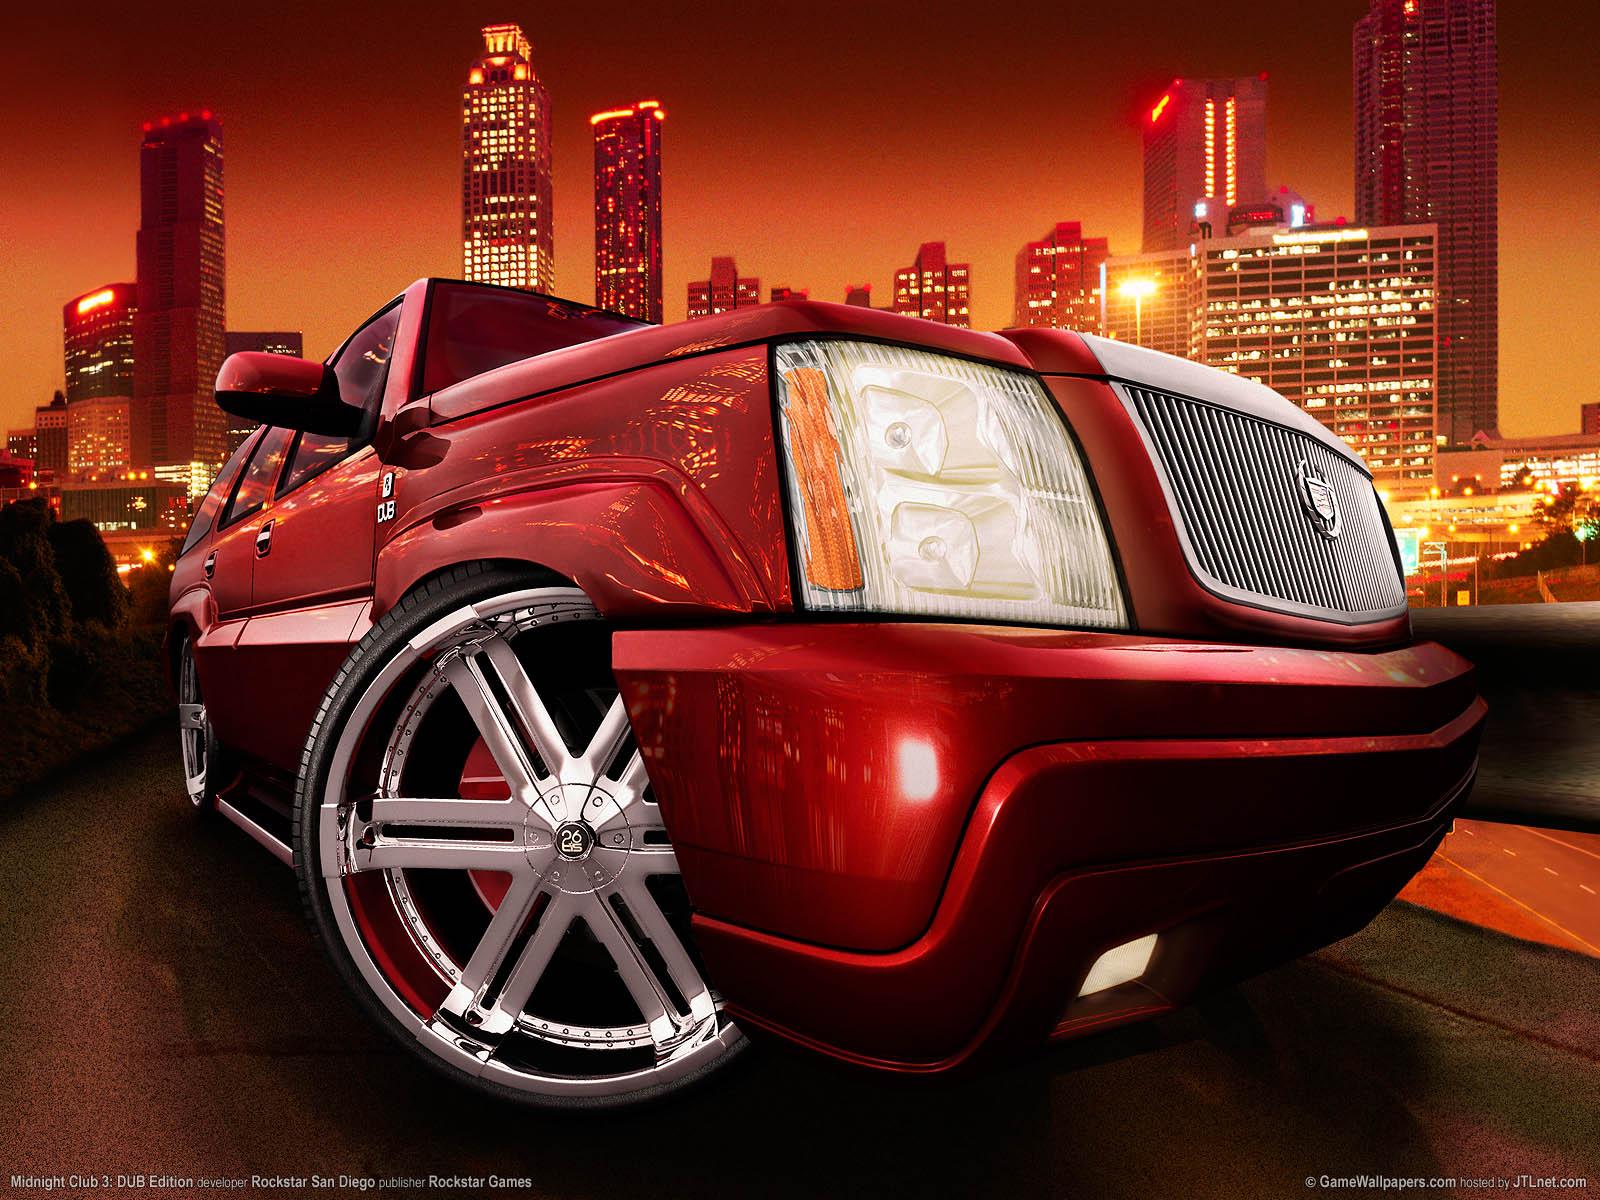 Autos Tunados - Fotos de carros tunados, carros tuning